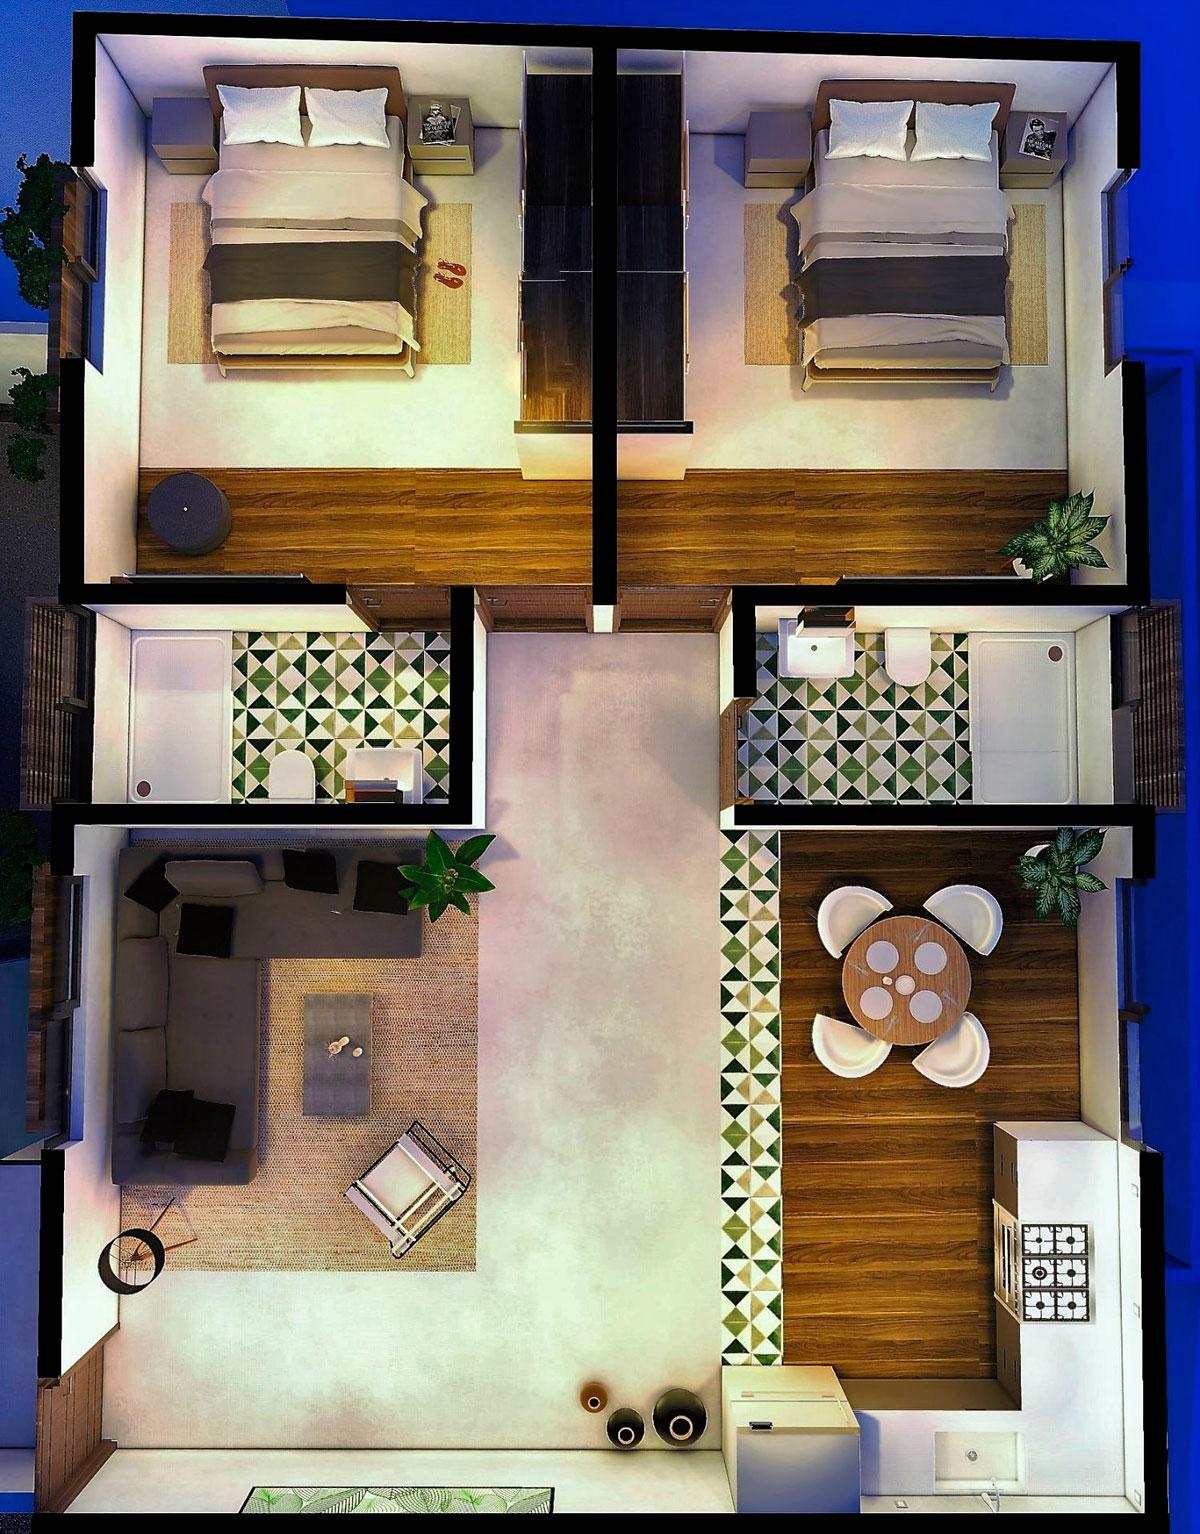 planta2rec_desarrollo_ikal_residences_puerto_morelos.jpg